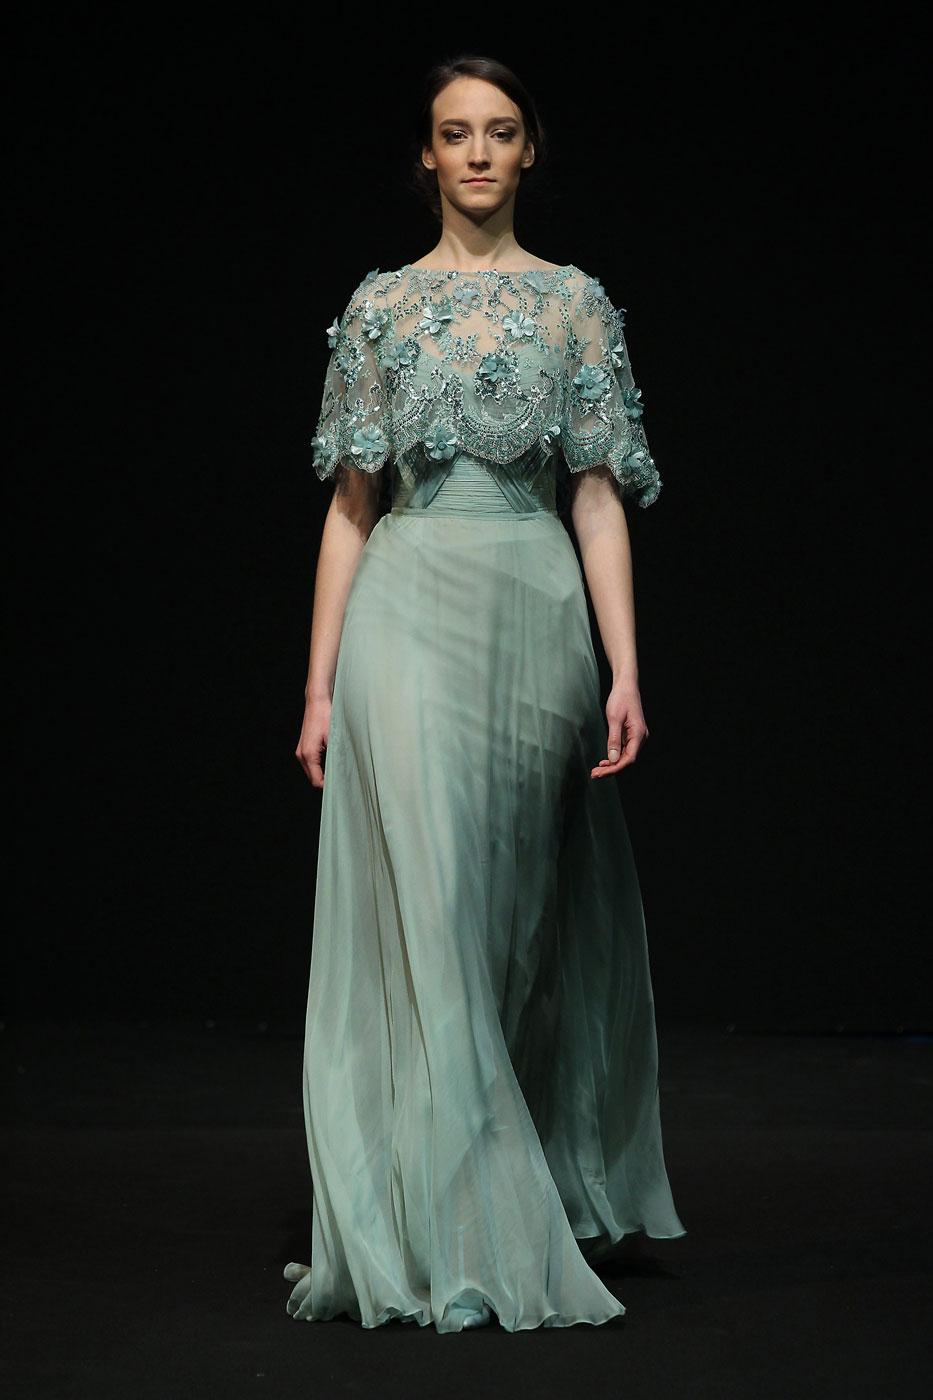 Abed-Mahfouz-fashion-runway-show-haute-couture-paris-spring-2015-the-impression-07